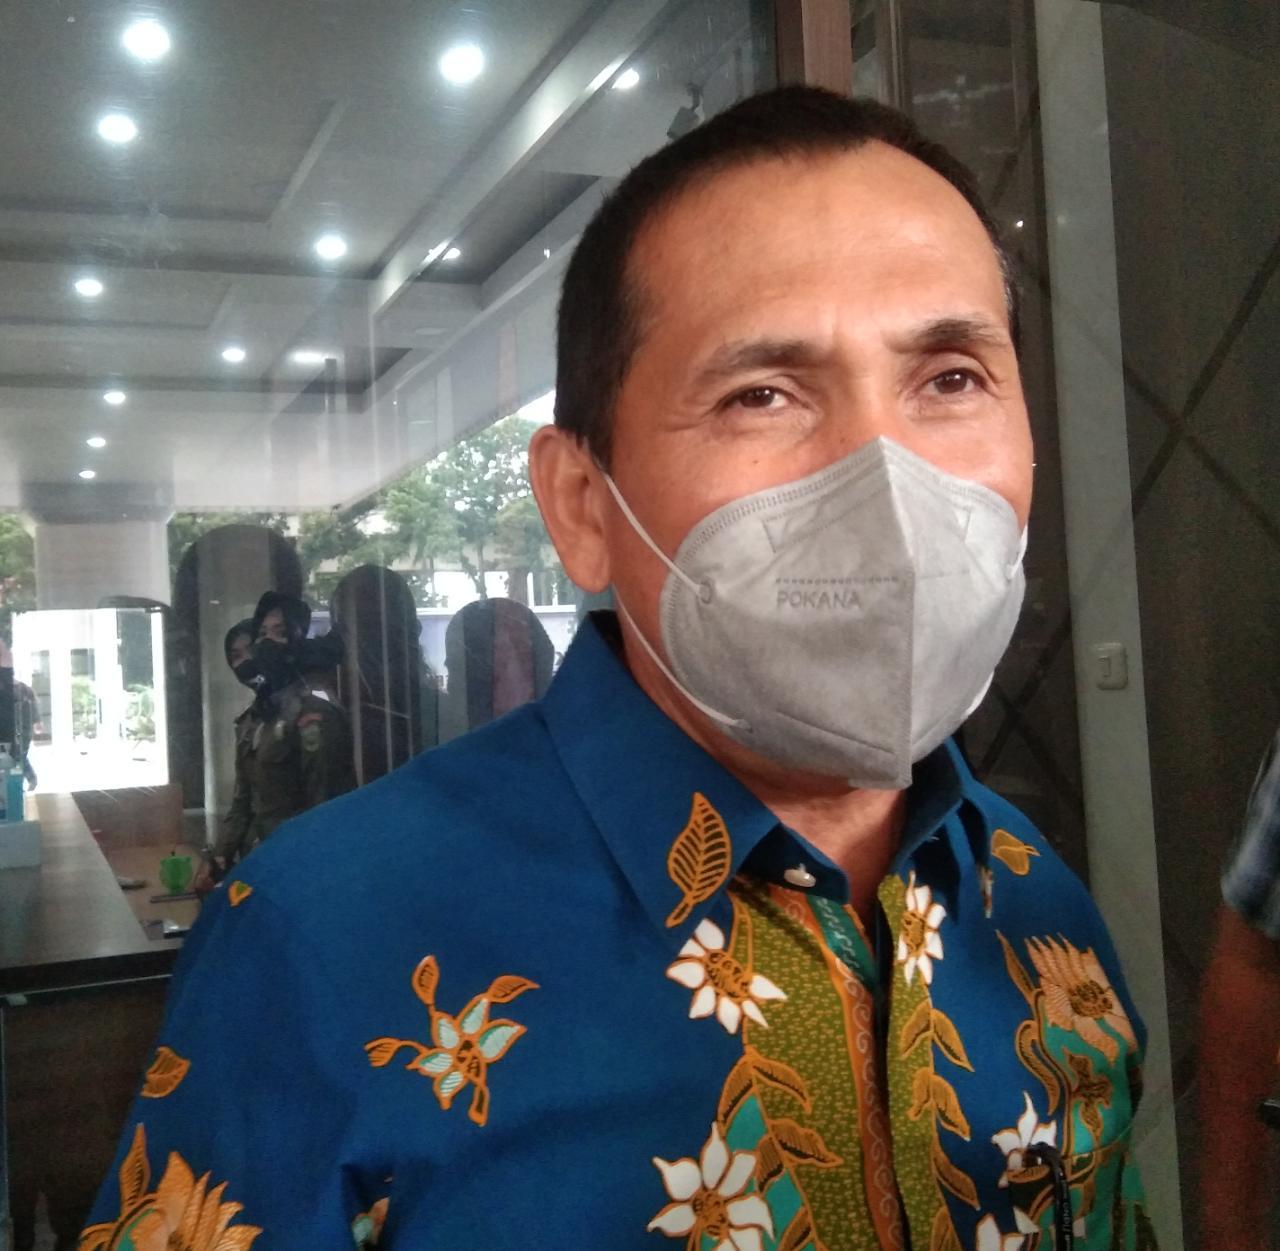 Wali Kota Lubuklinggau, SN Putra Prana Sone